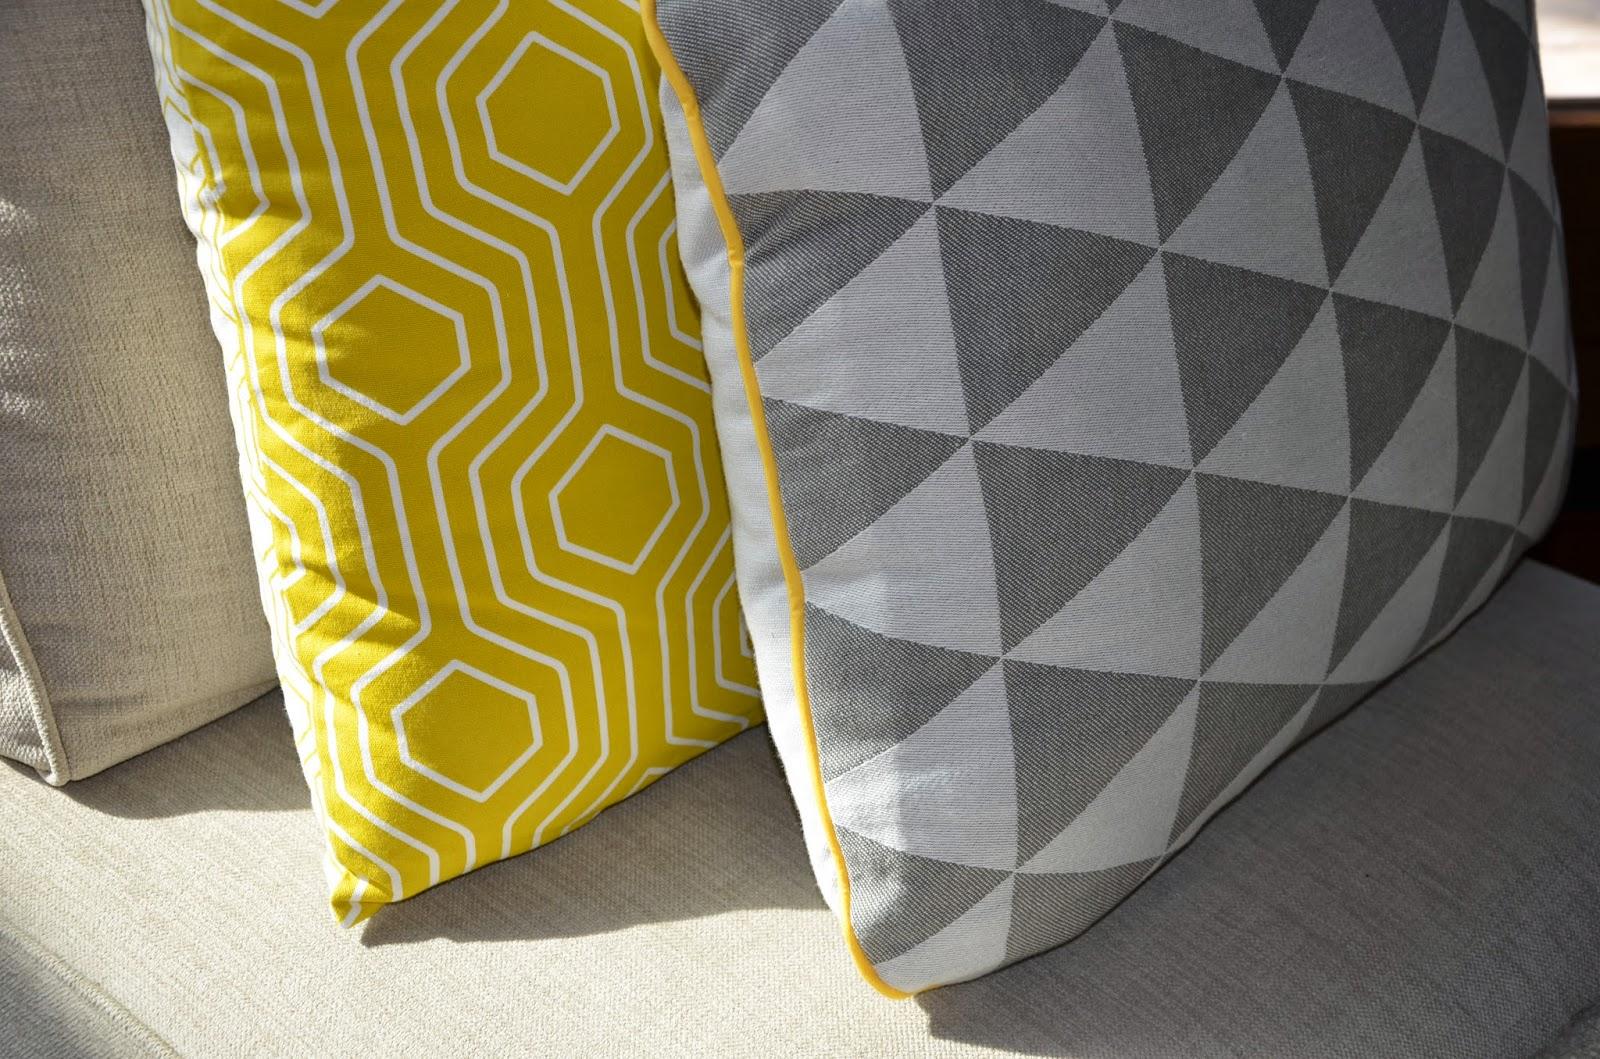 coussin jaune citron images. Black Bedroom Furniture Sets. Home Design Ideas